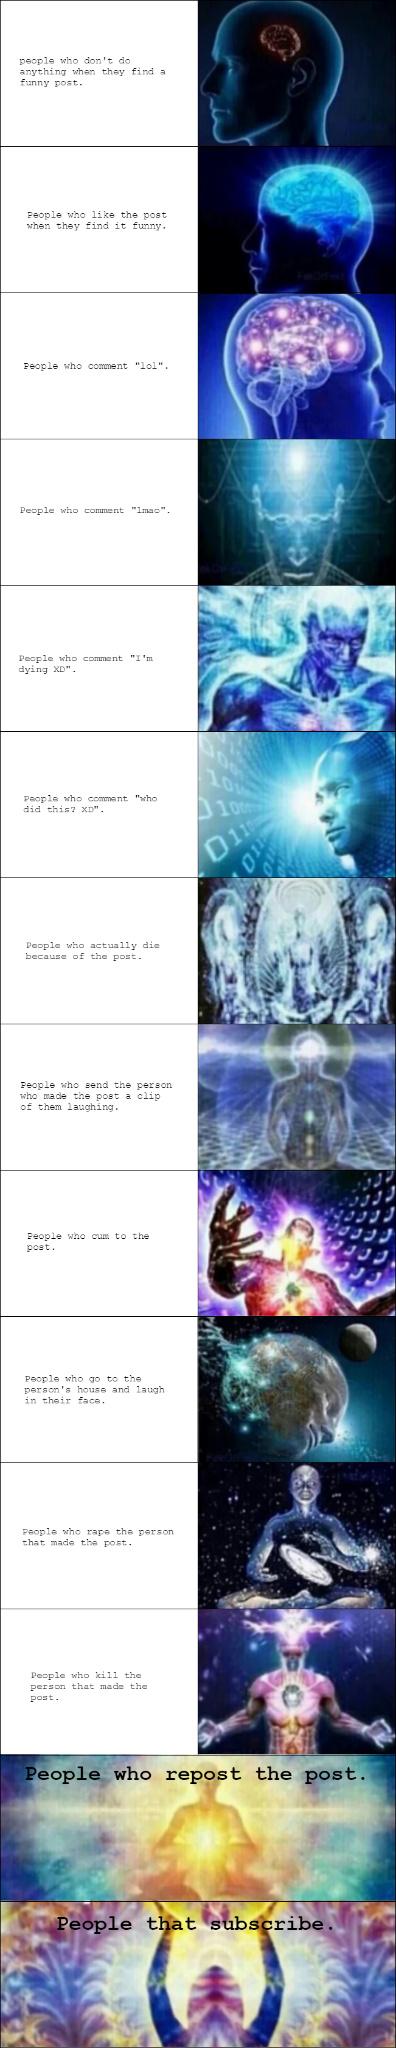 Post. - meme